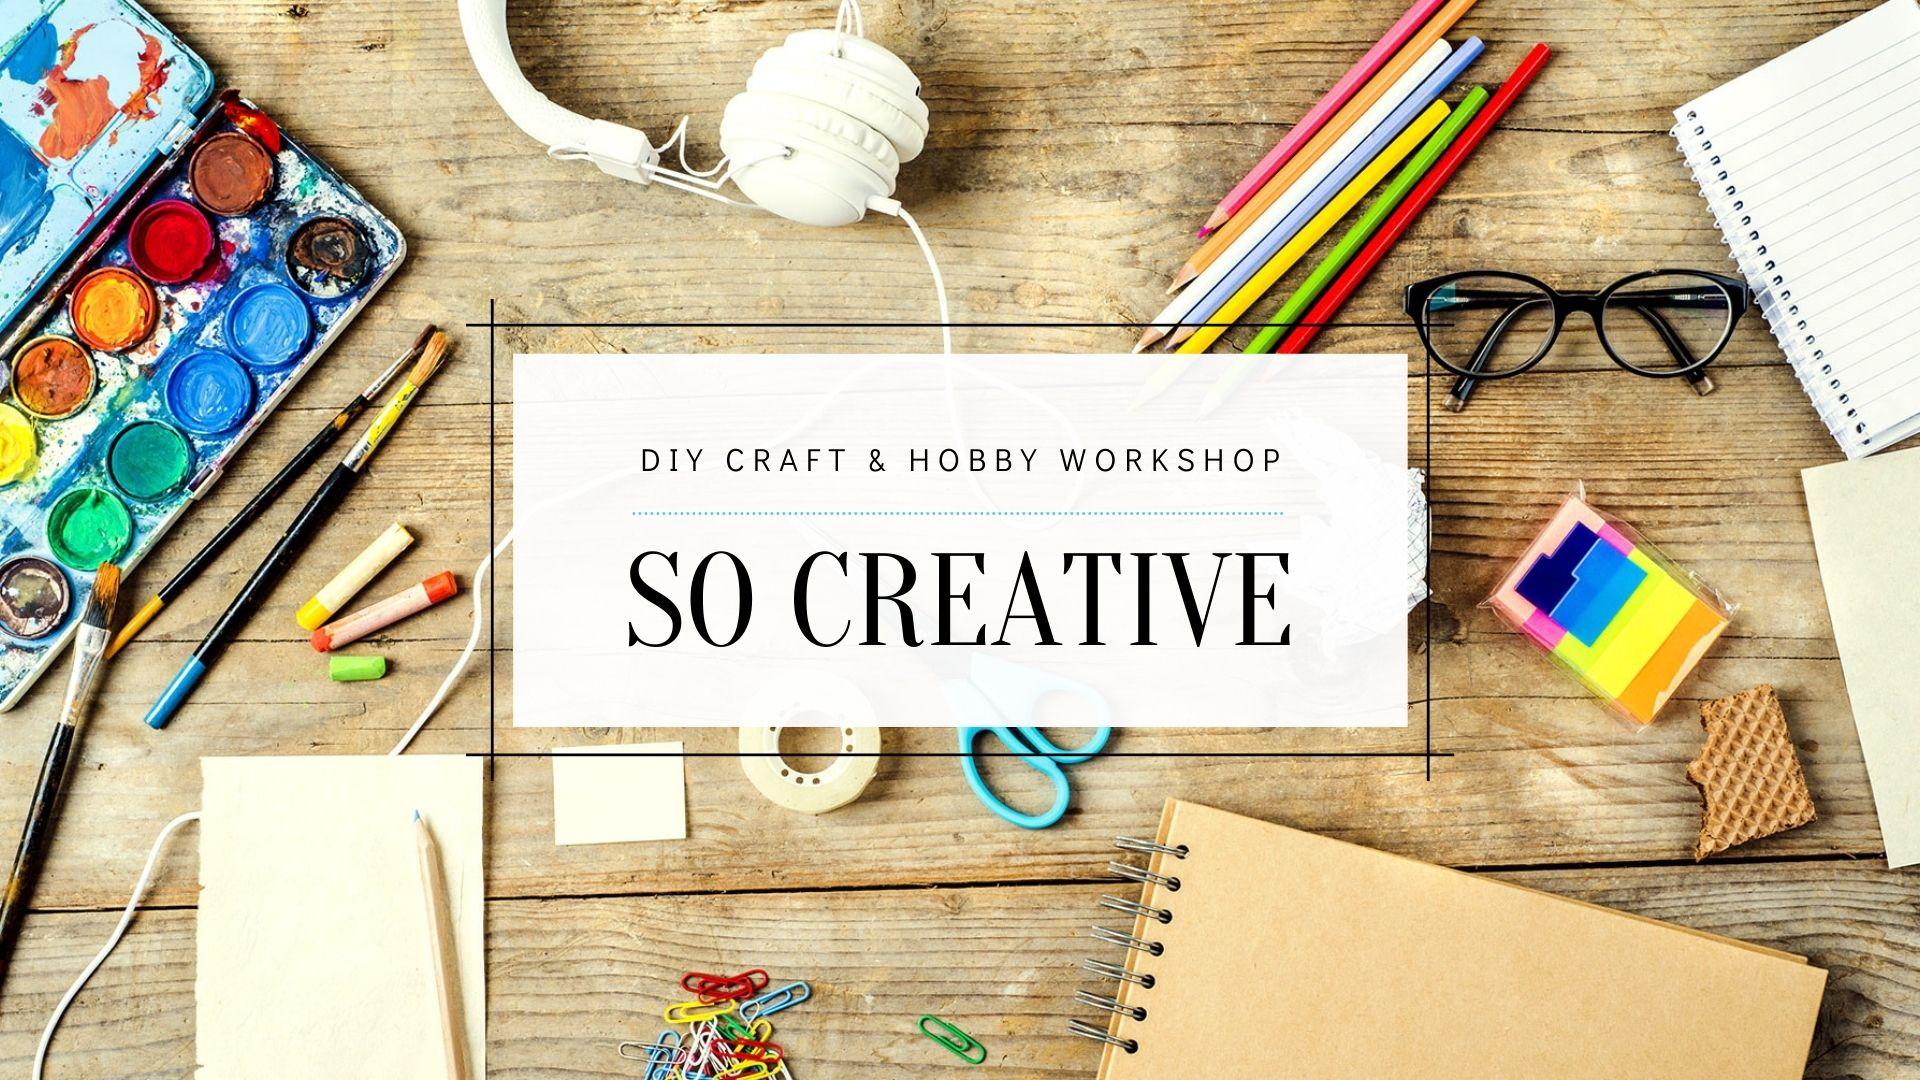 so creative diy craft workshop